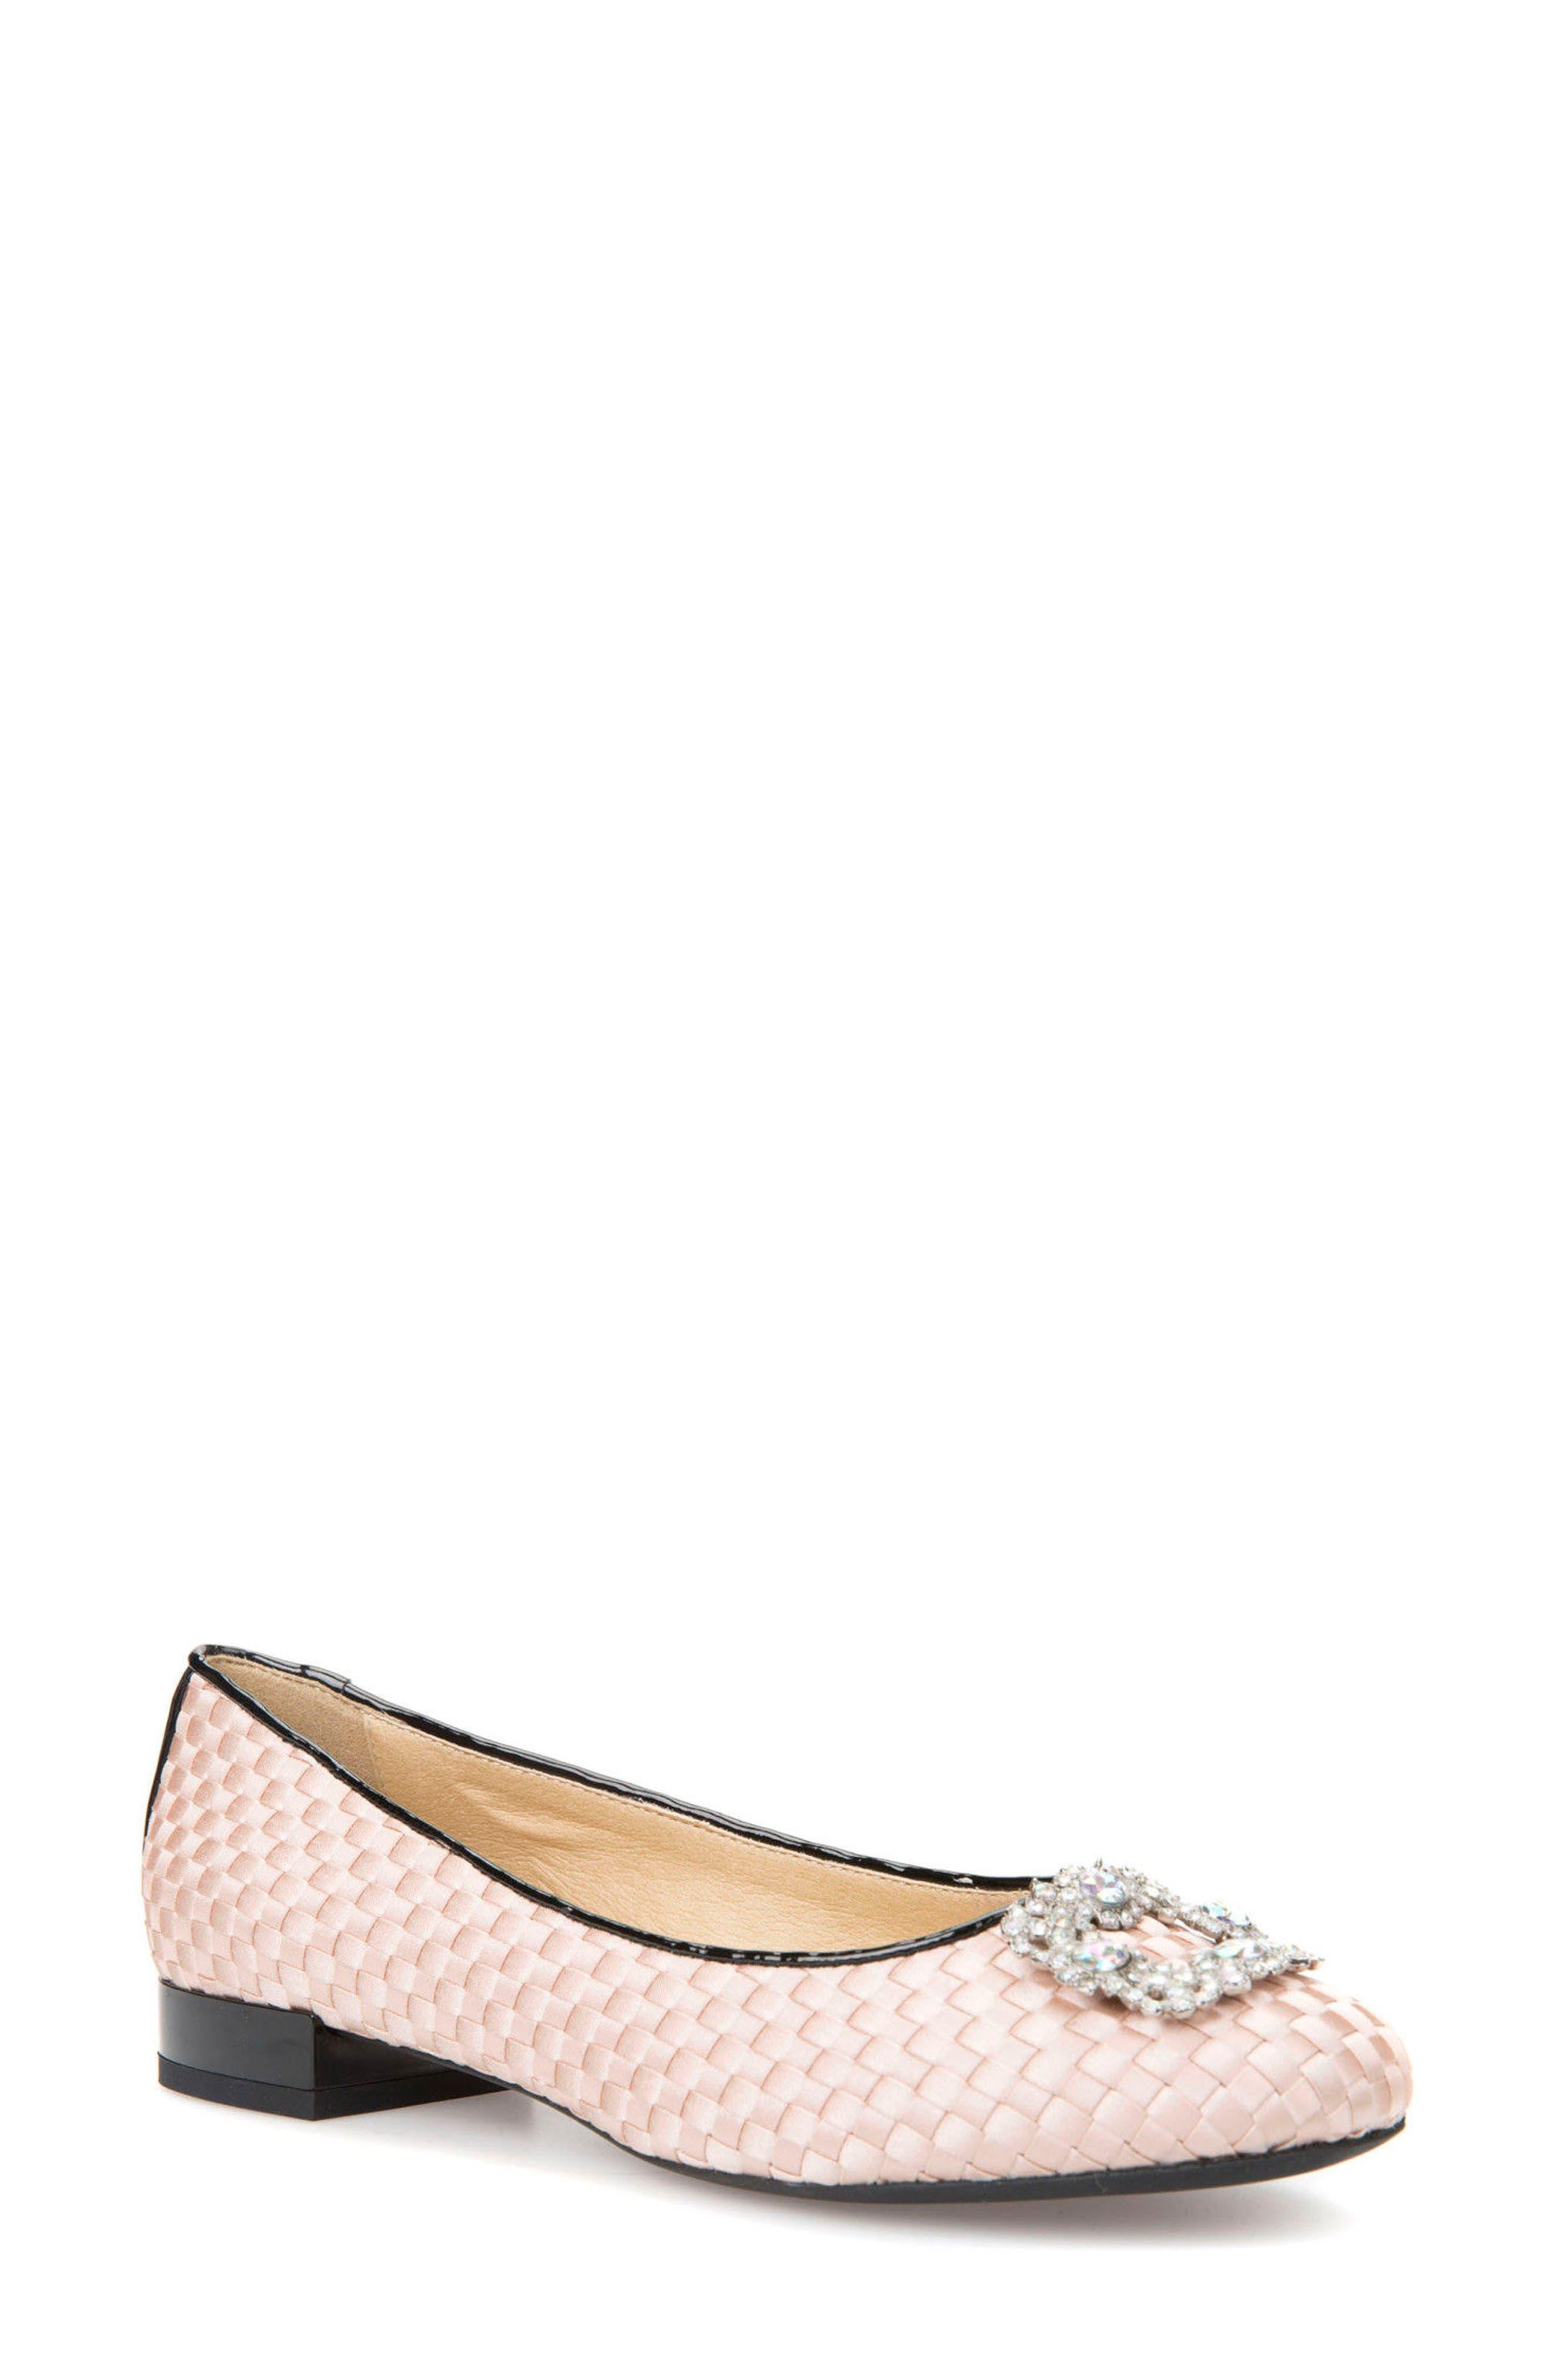 Main Image - Geox Wistrey Woven Embellished Slip-On (Women)